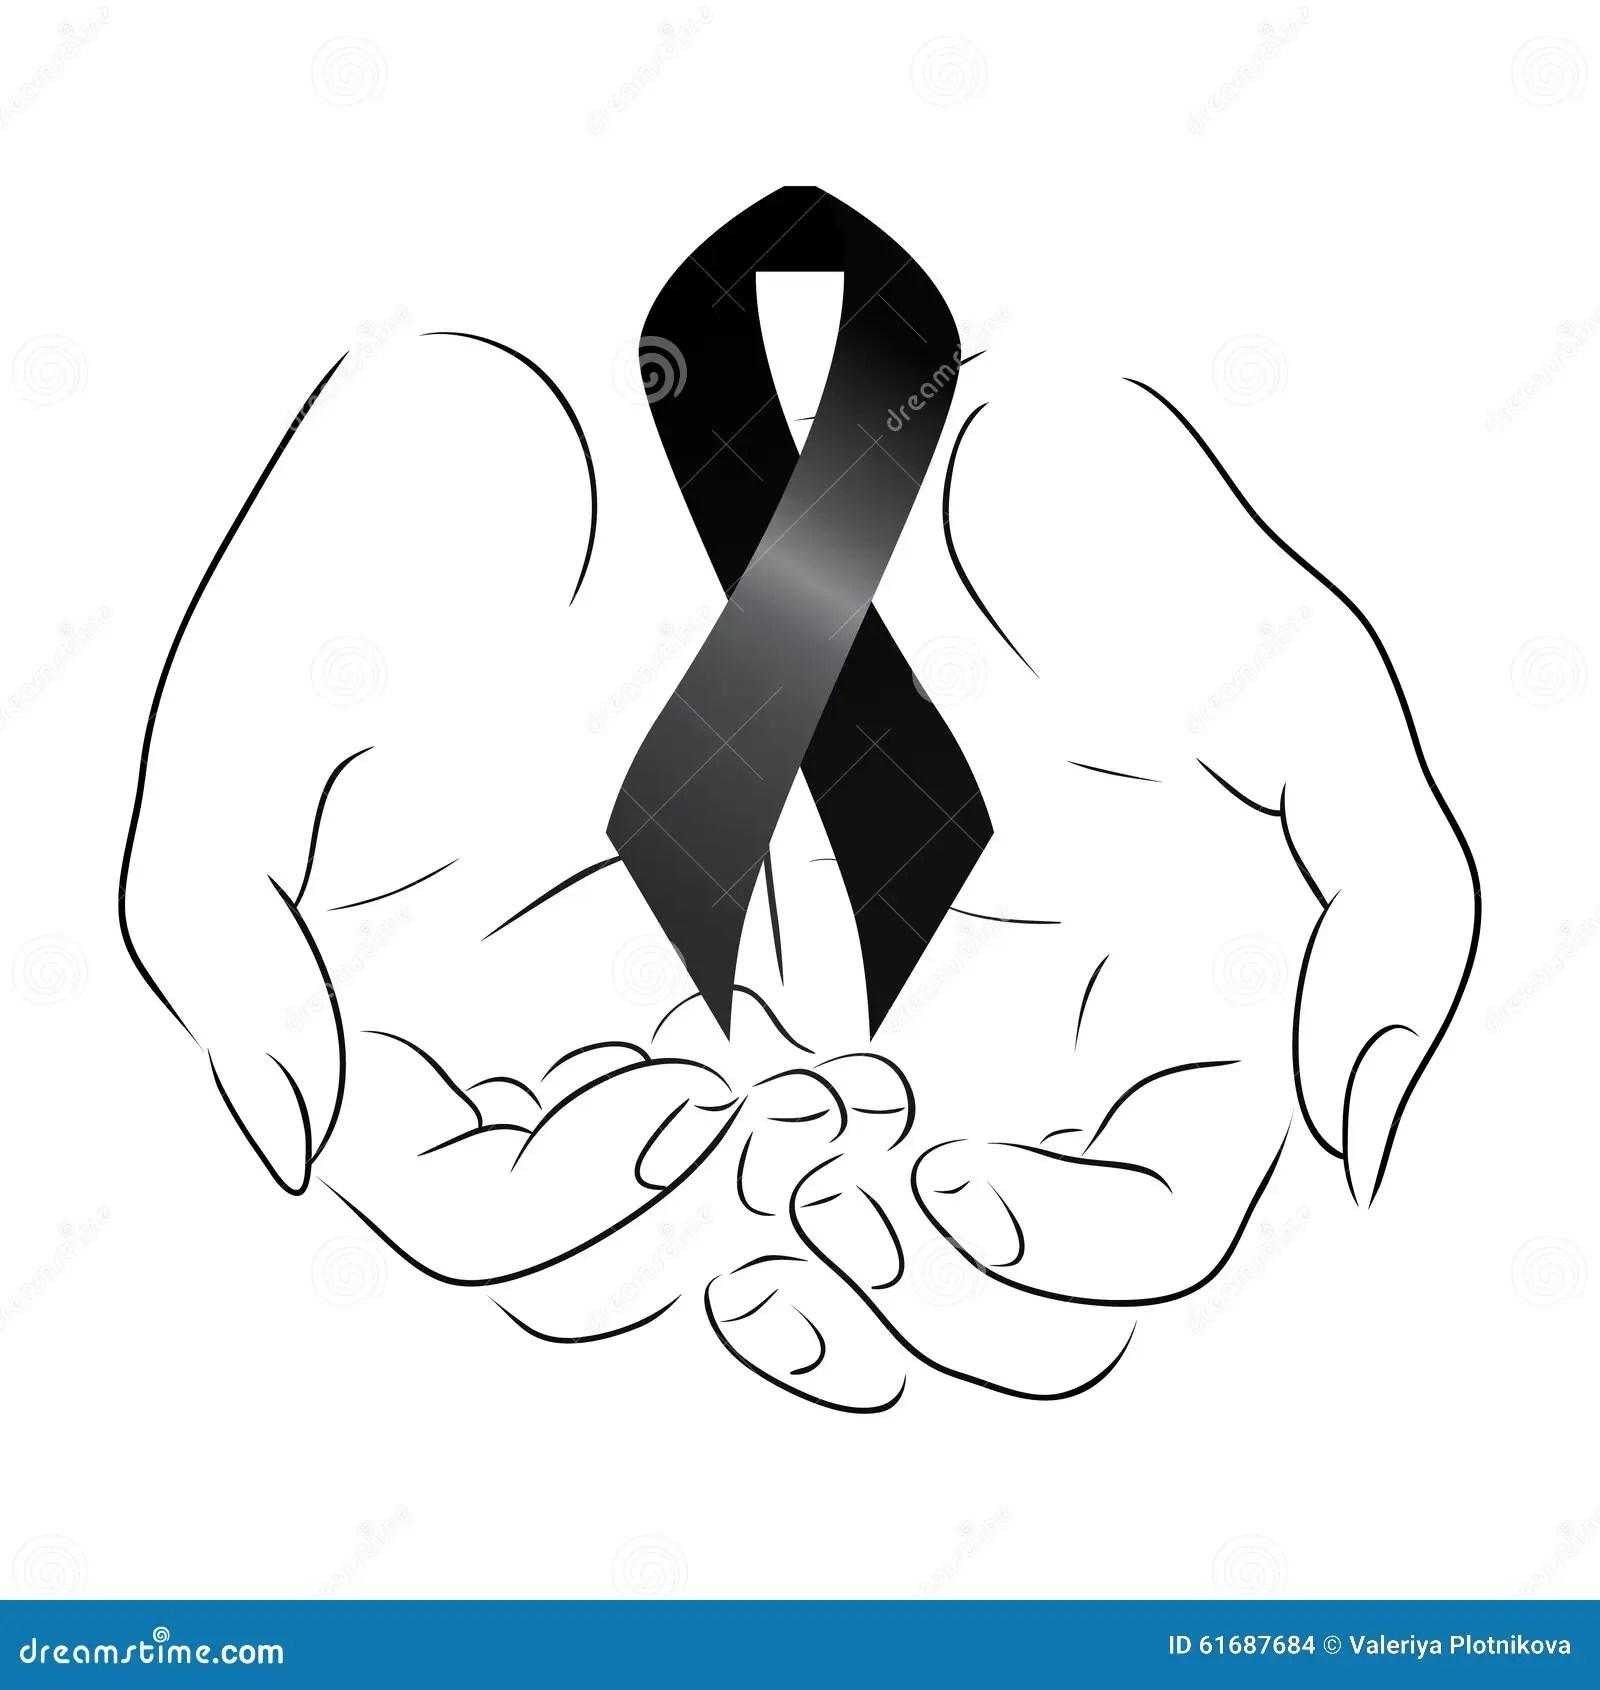 Black Mourning Ribbon Royalty Free Stock Photography